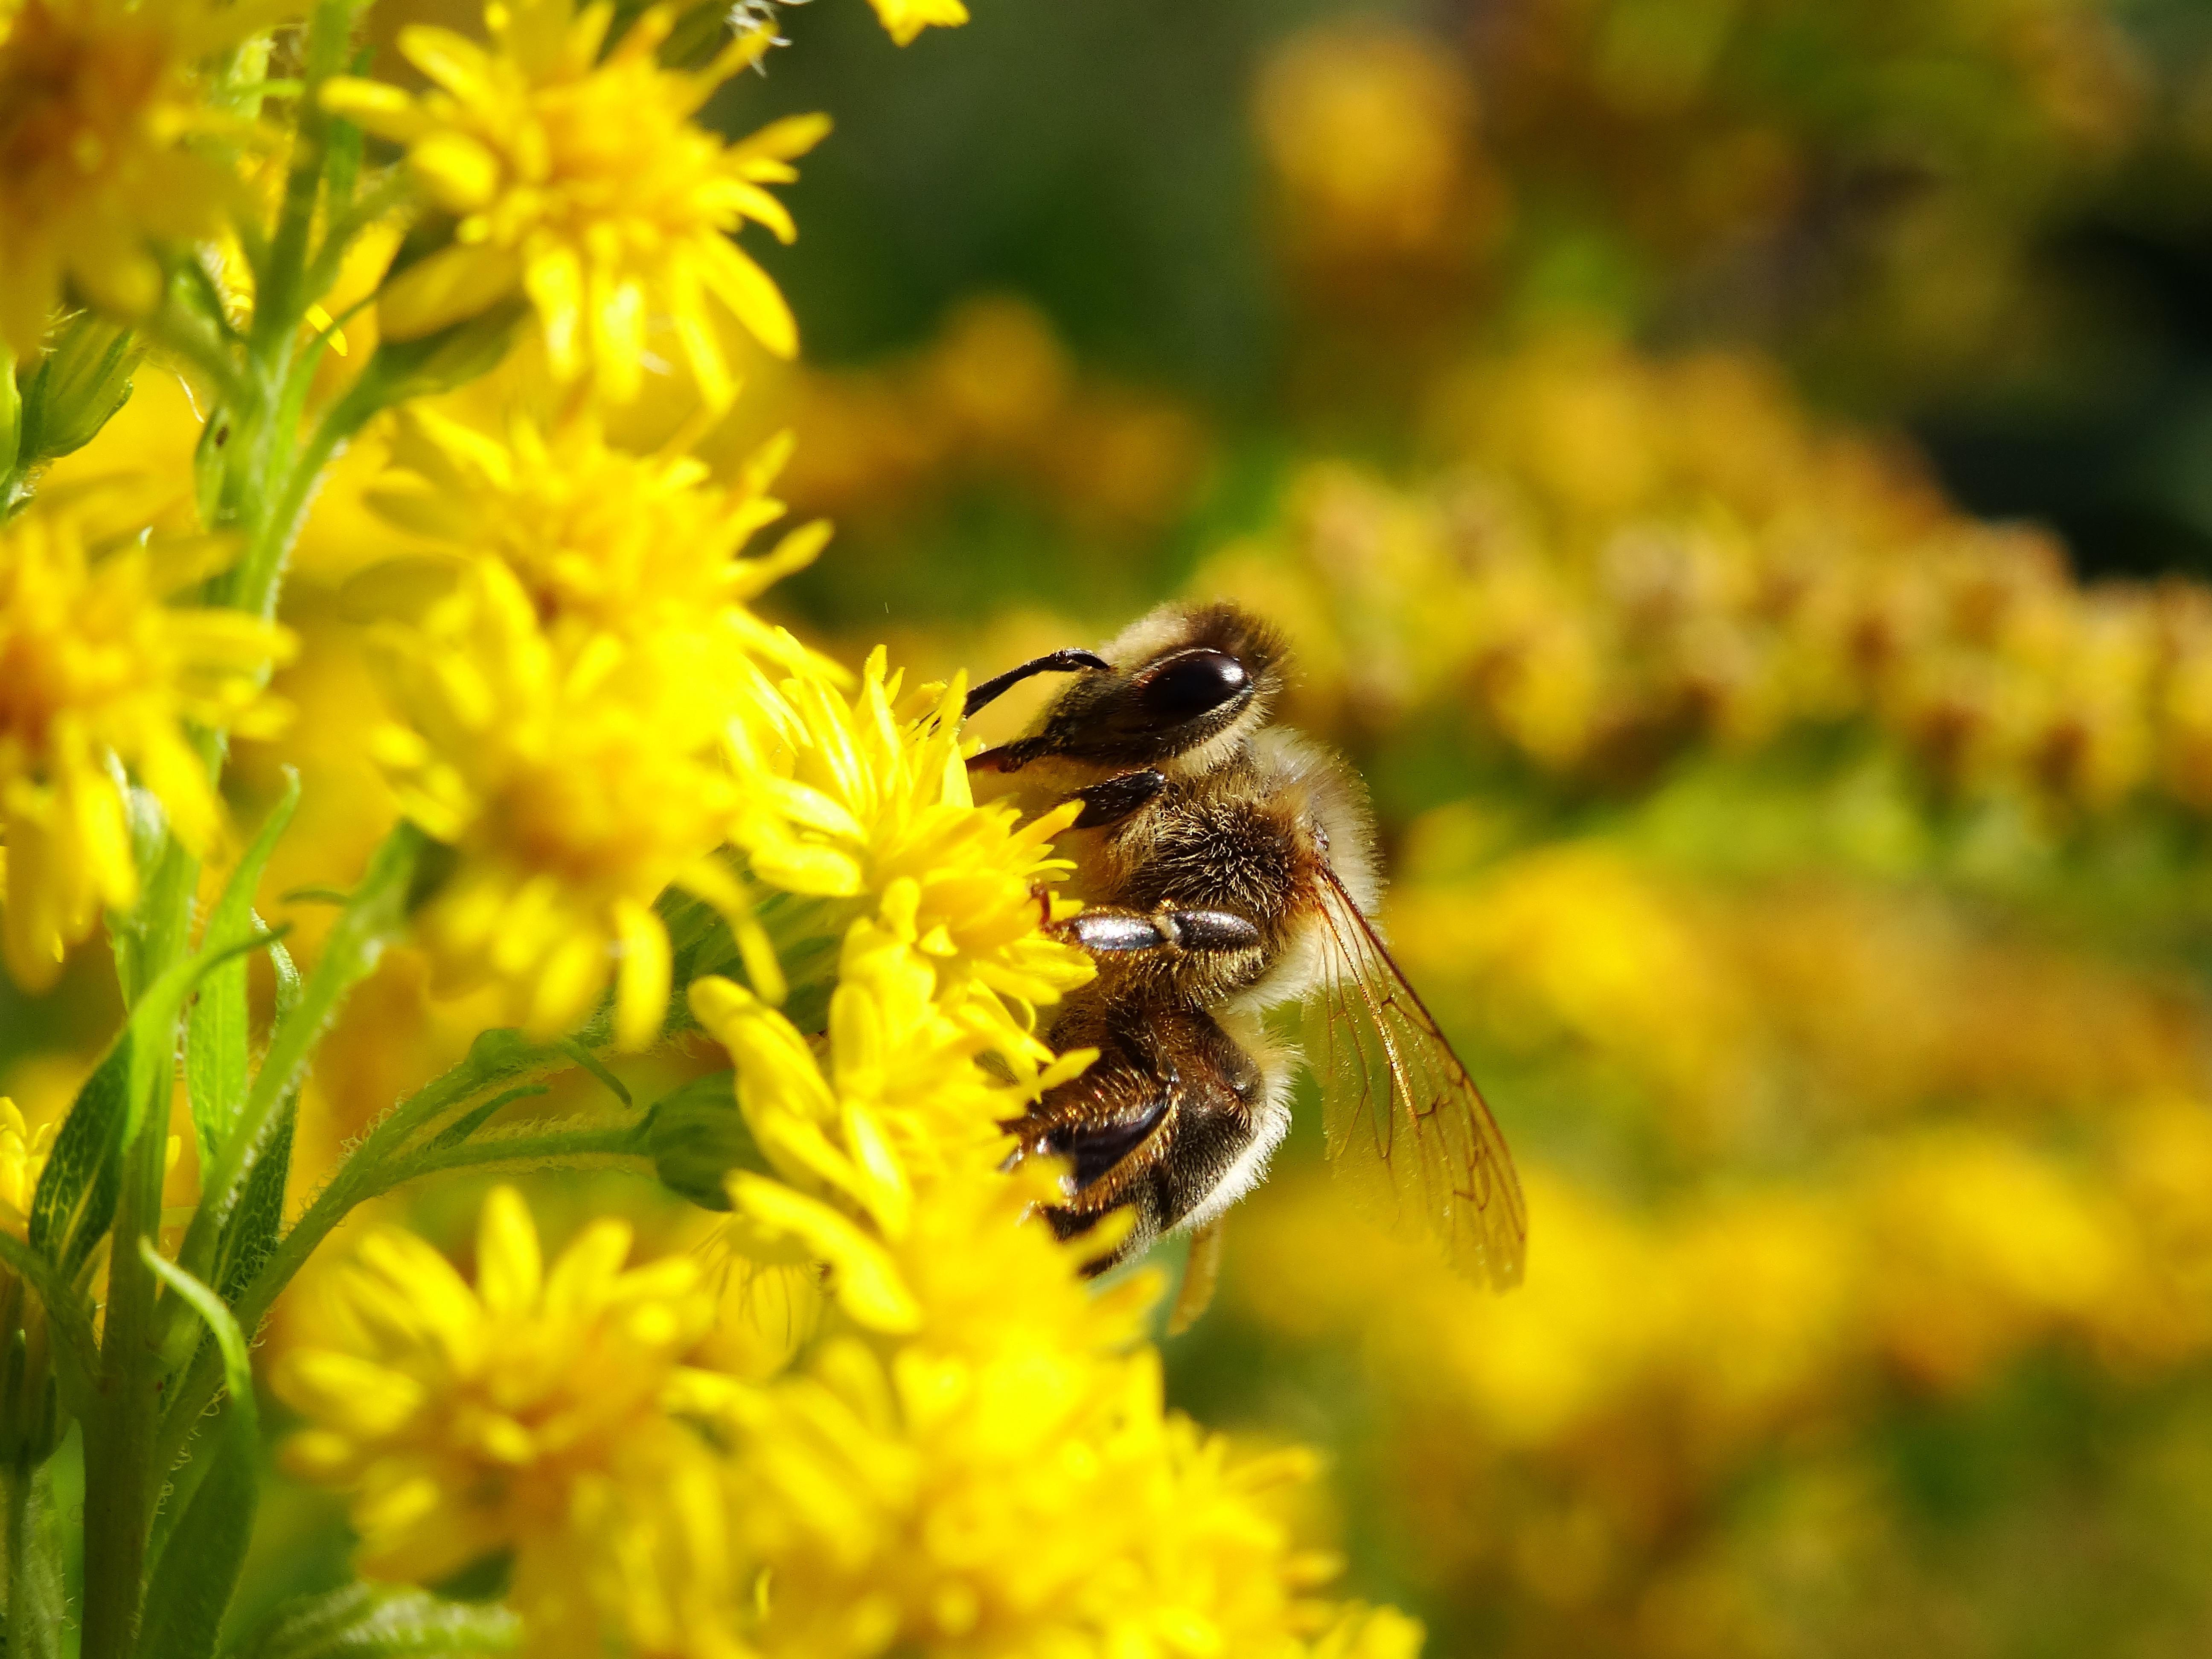 Fotos gratis naturaleza prado miel fauna silvestre for Ahuyentar abejas jardin